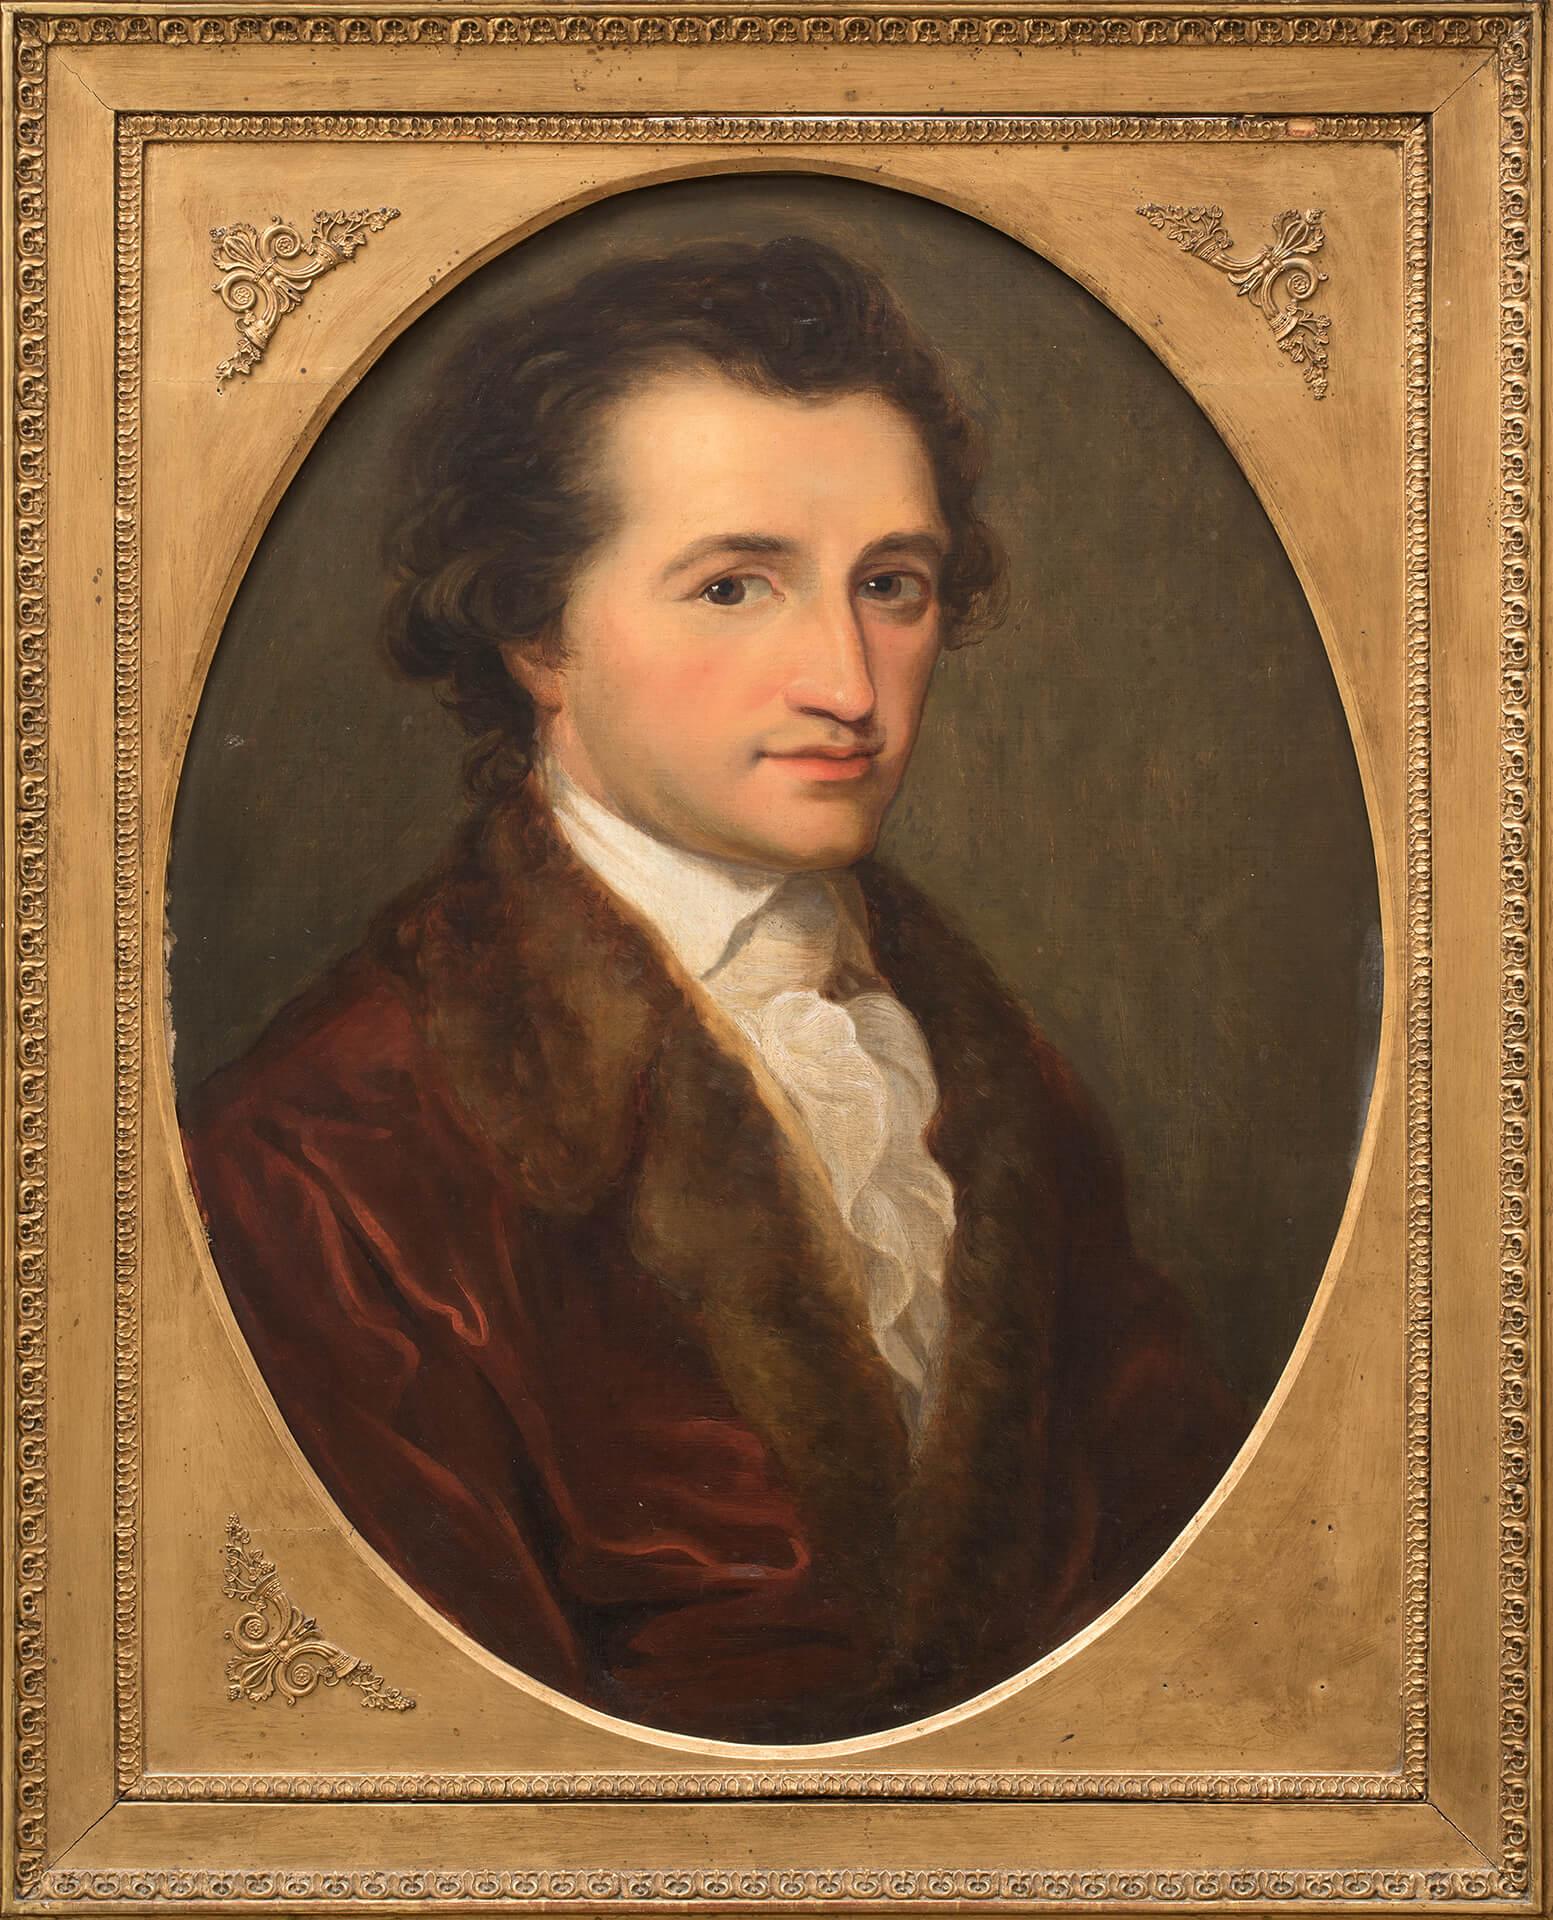 E. Ritschl da A. Kauffmann, Goethe. Seconda metà del XIX sec.